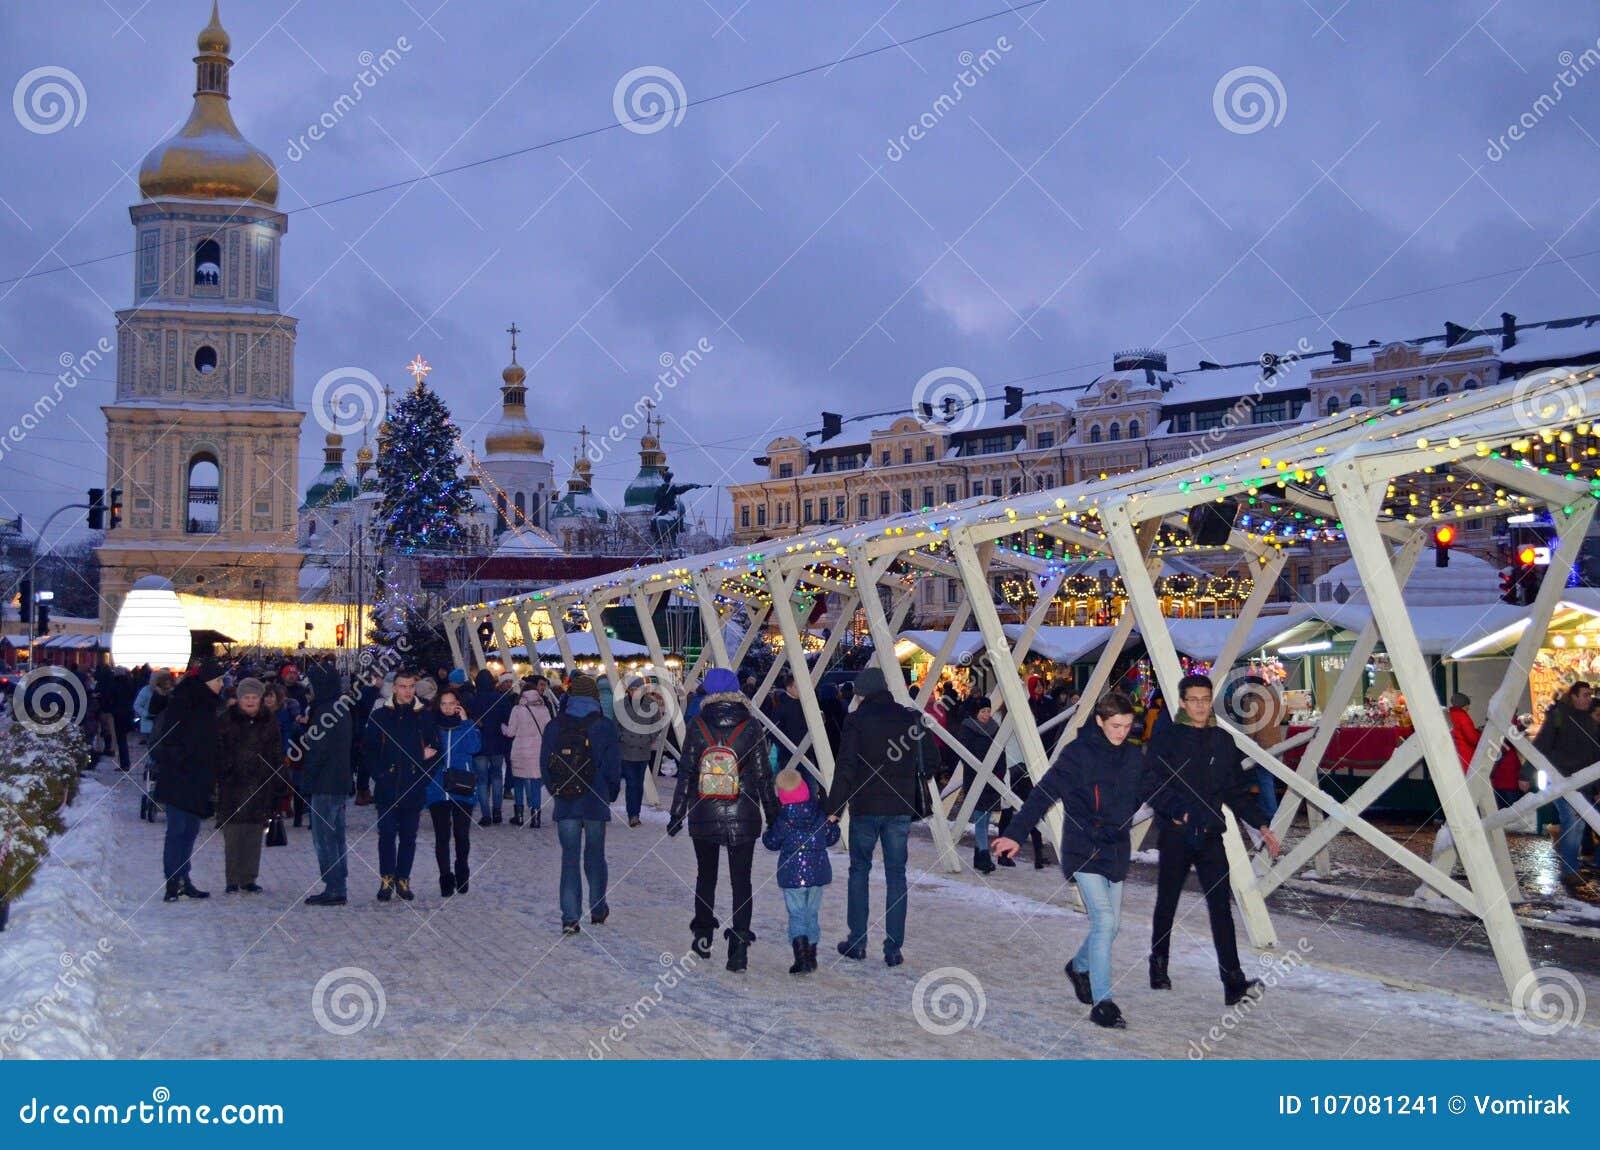 KIEV, UKRAINE - December 23, 2017: Decorated for Christmas and New Year Sophia Square in Kiev